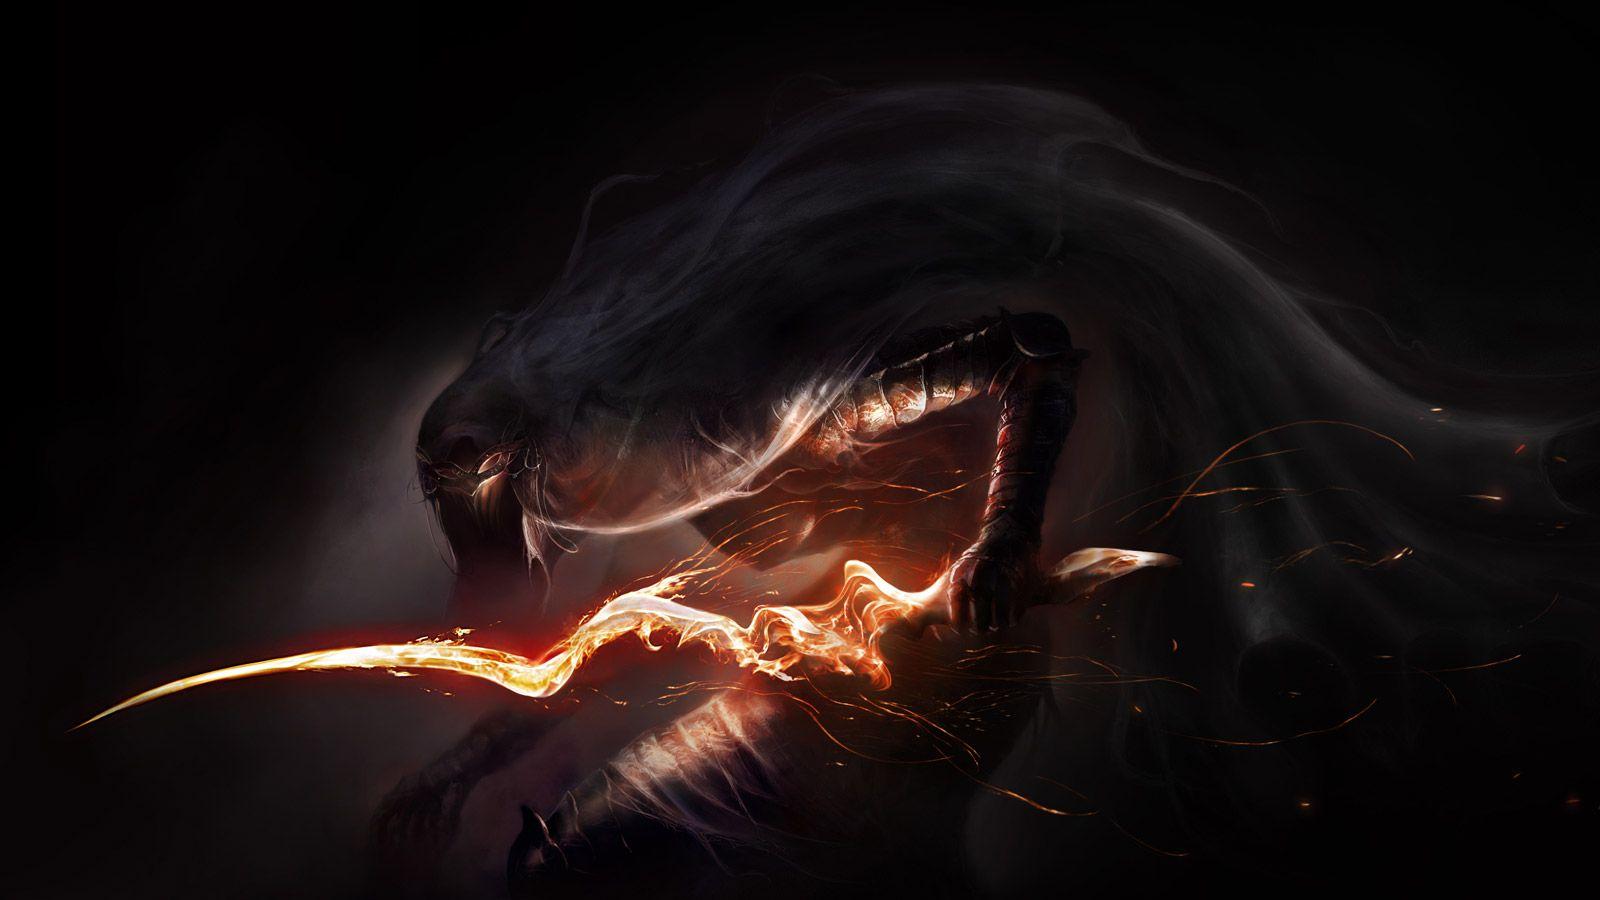 Dark Souls 3 Monster HD Wallpaper 1600x900